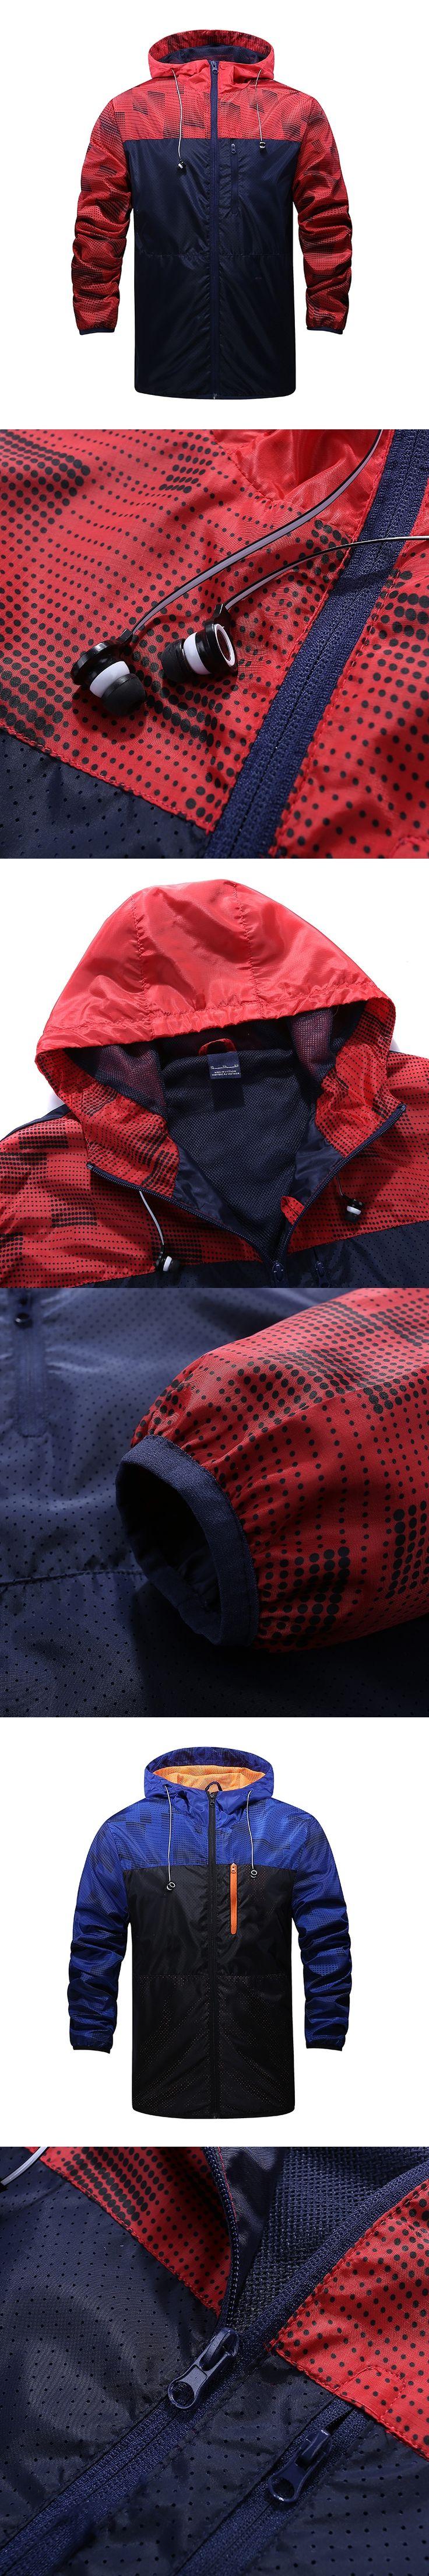 Spring And Fall Men's Windbreaker casual jacket zipper cardigan men Stitching hooded jacket men sportswear coat Free Shipping